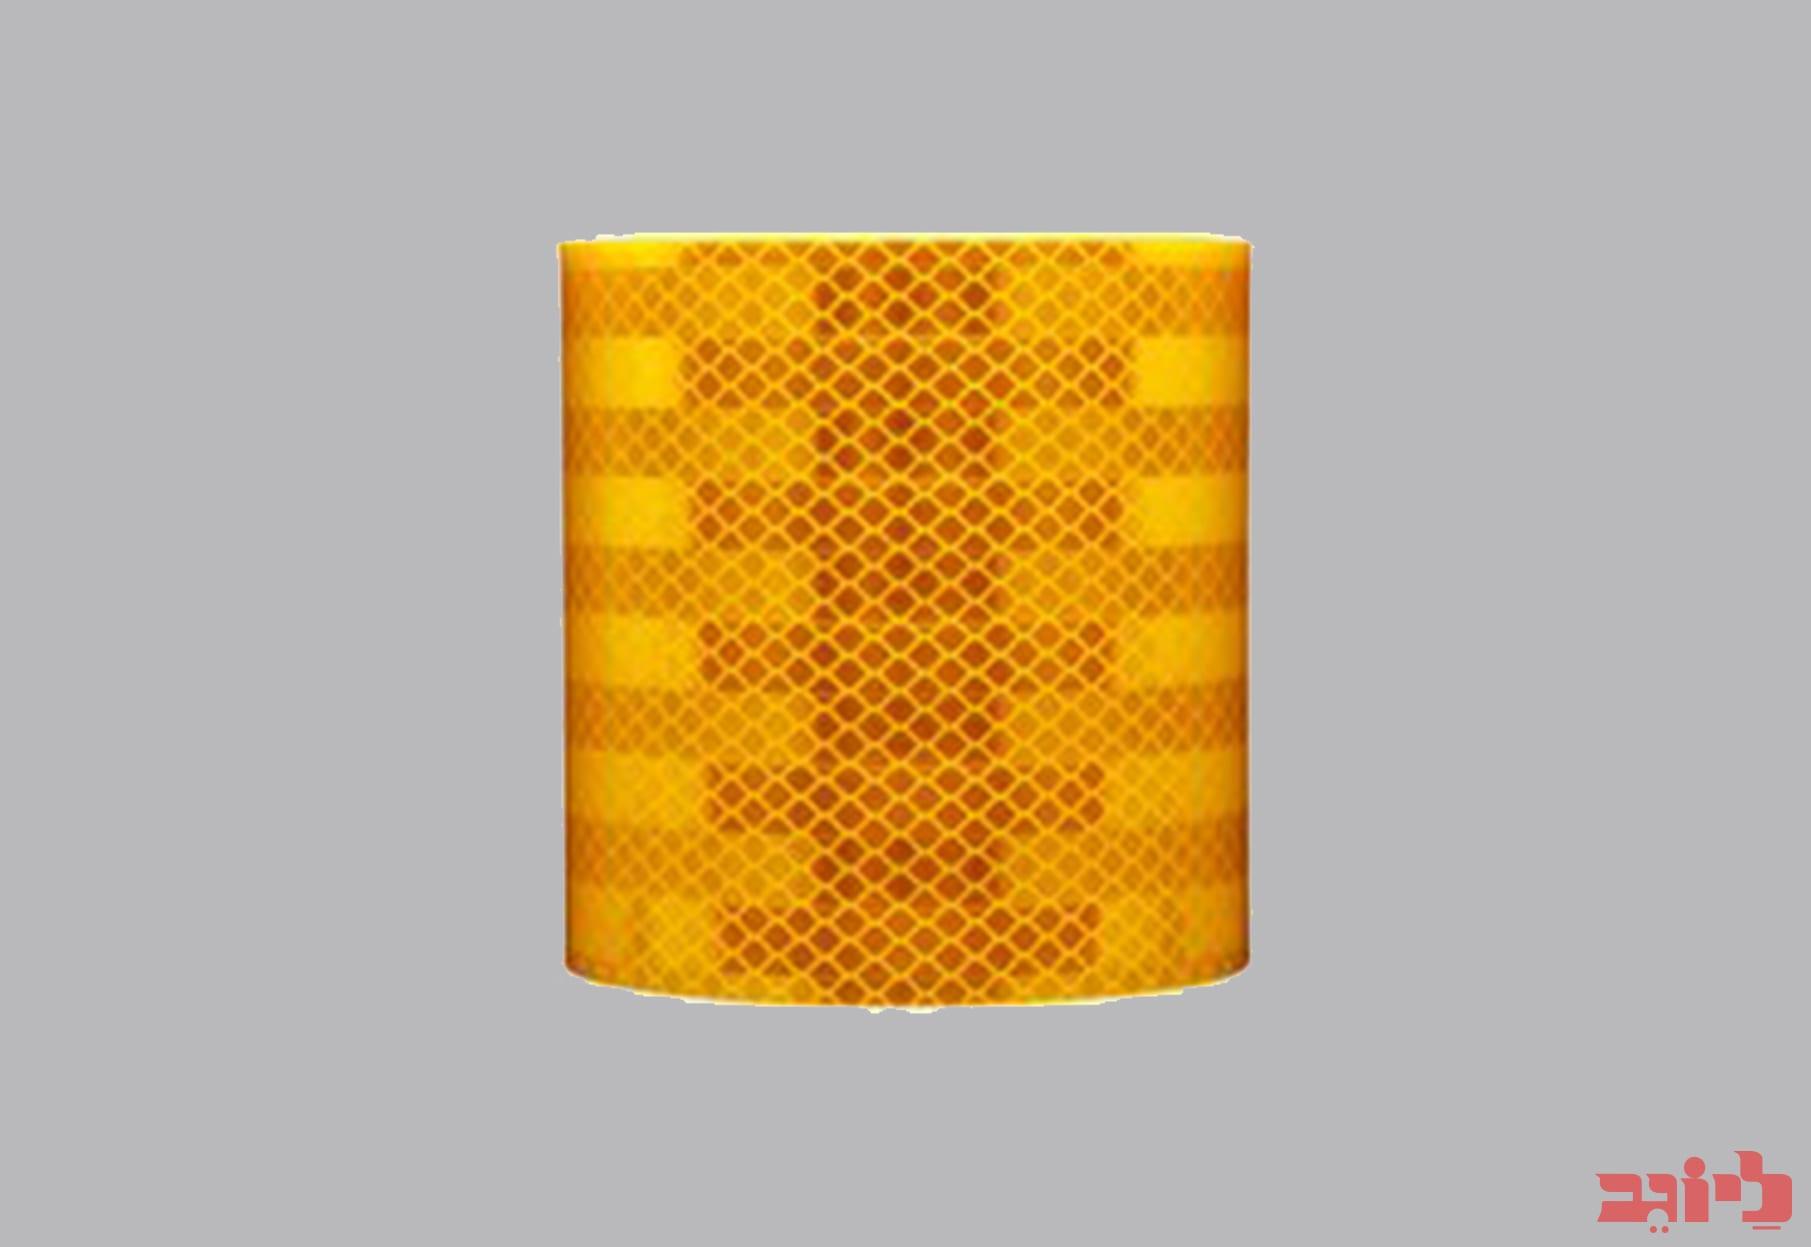 983-71-DGconspicuity_yellow_D